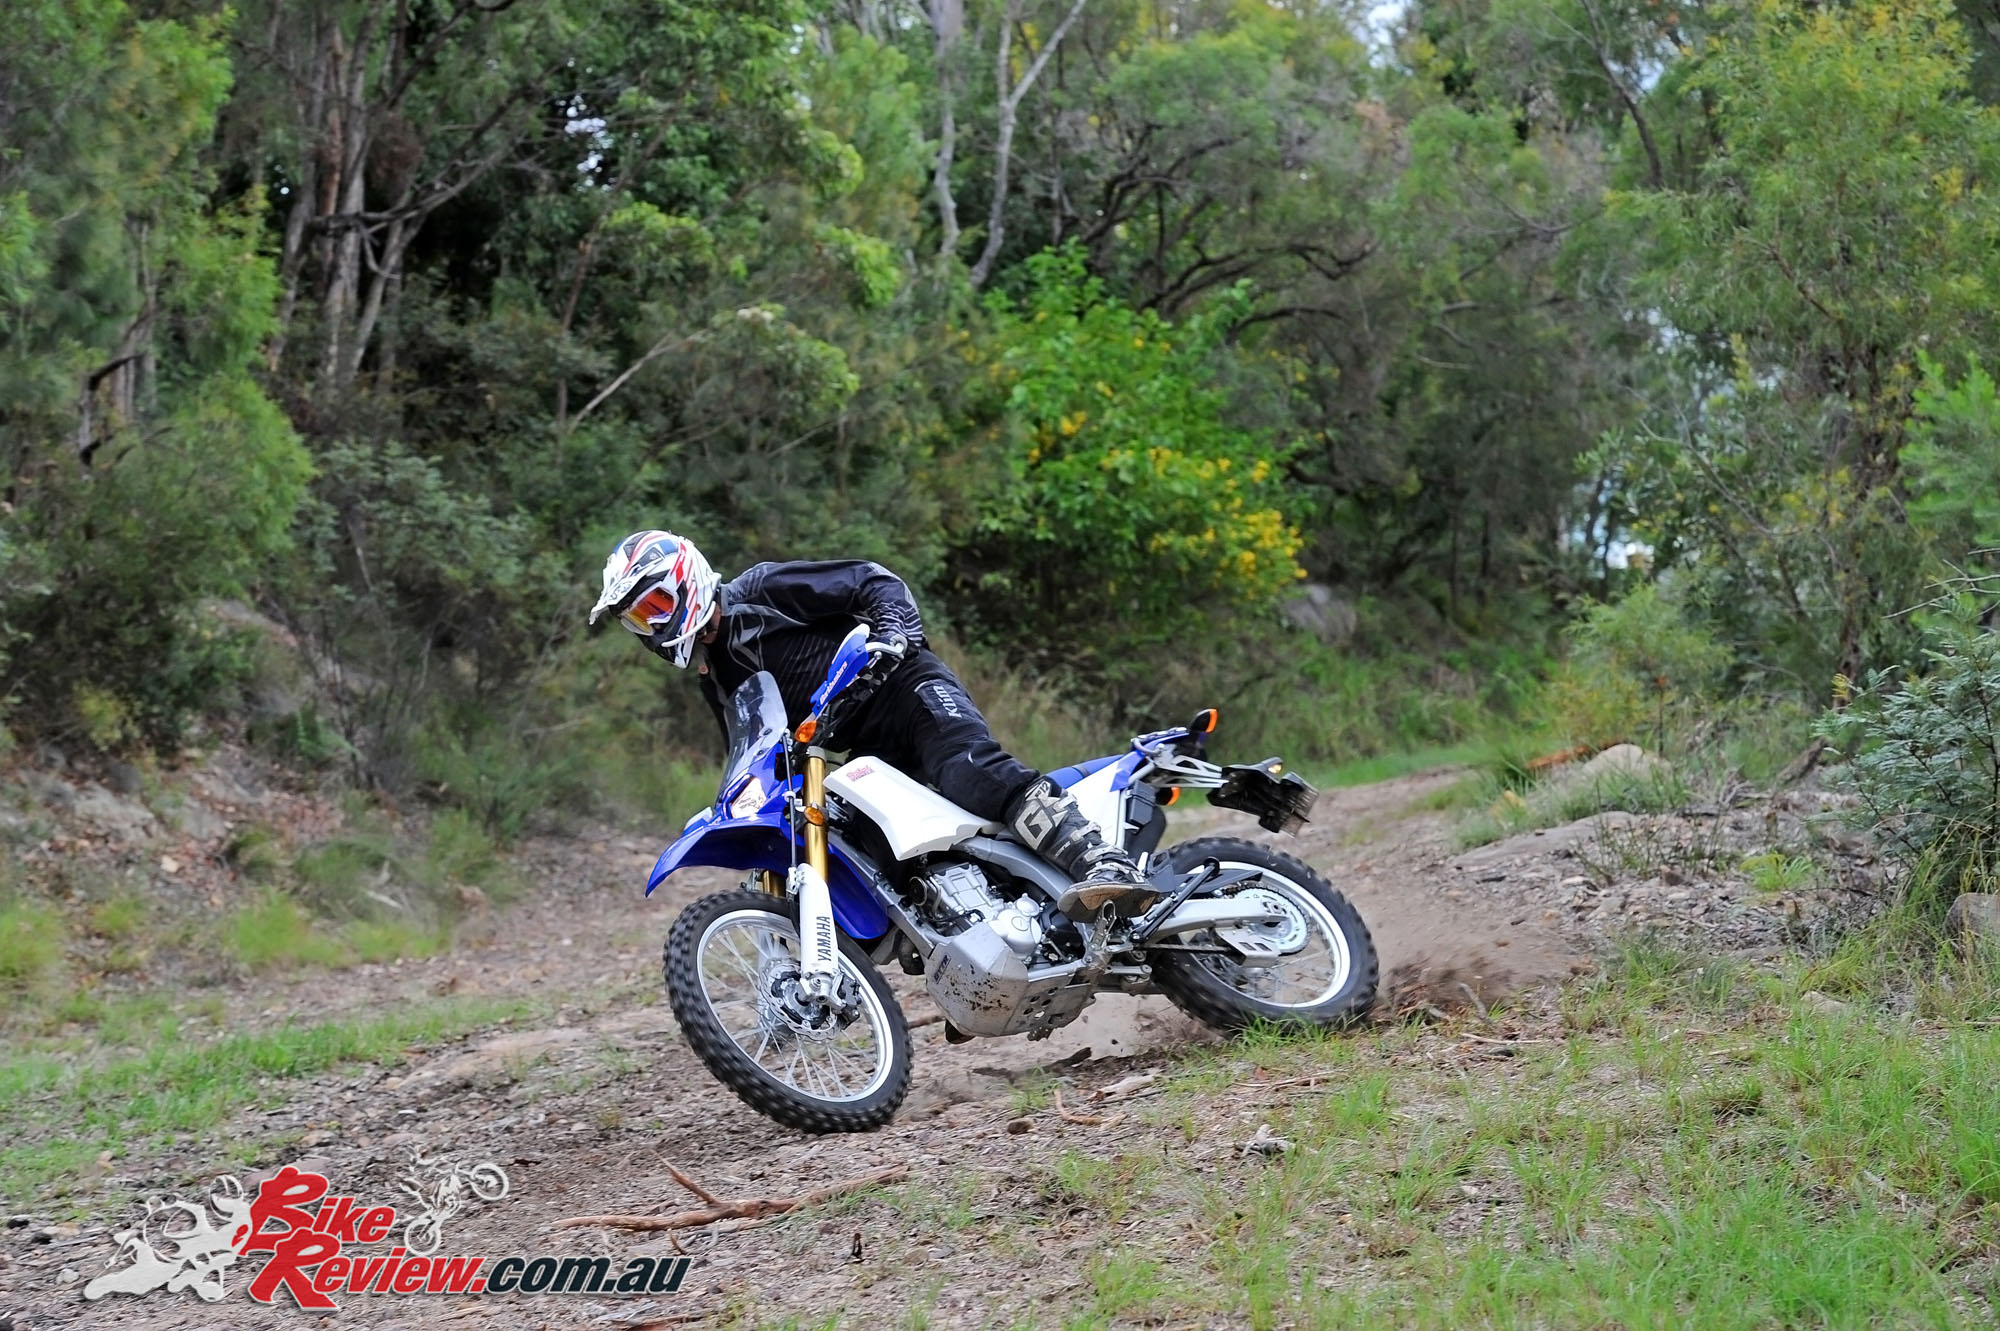 Yamaha Dirt Bike Review